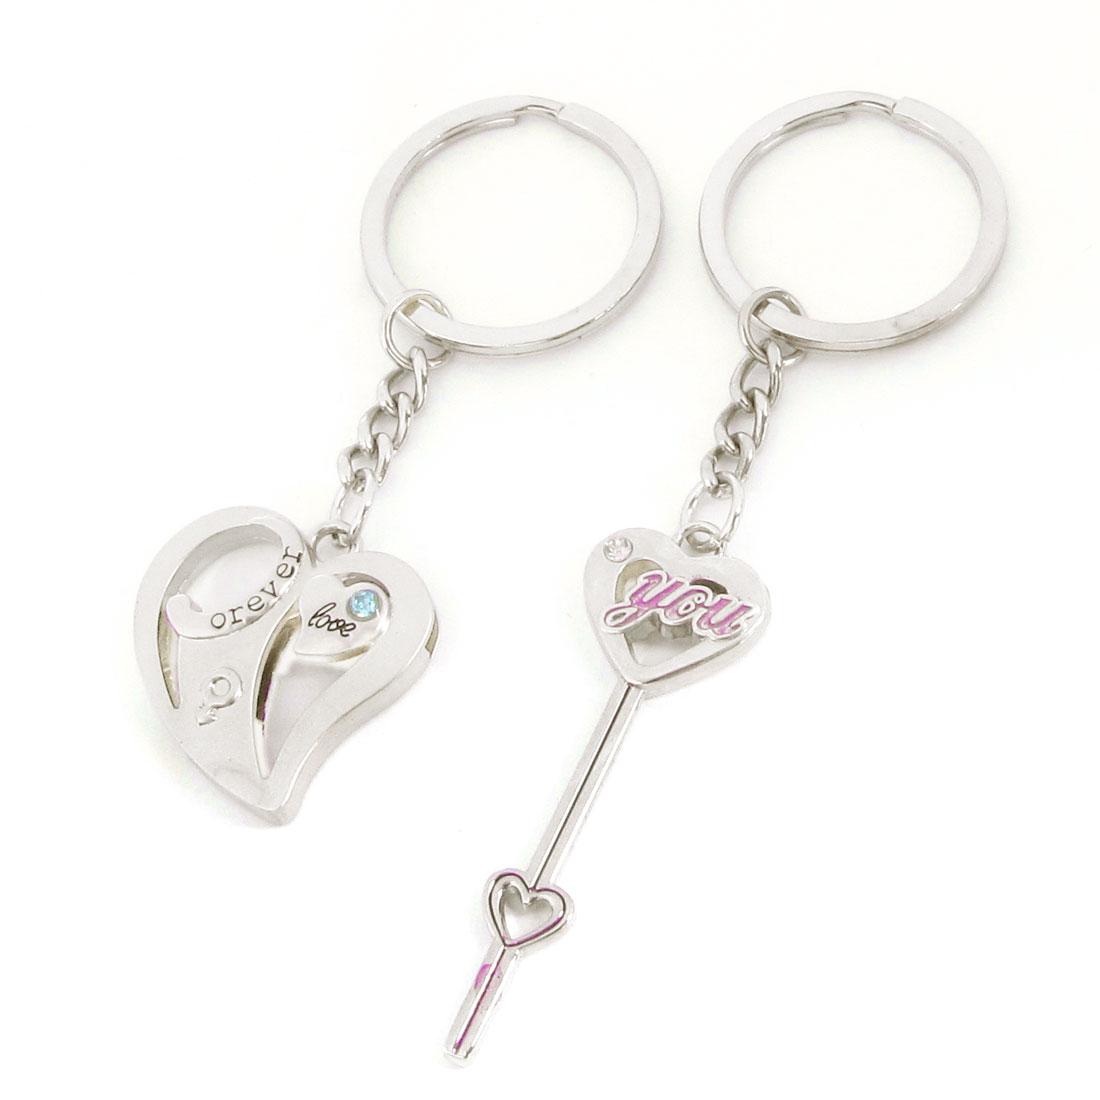 Heart Key Shape Pendant Glittery Rhinestones Decor Ring Keychain Pair for Lover